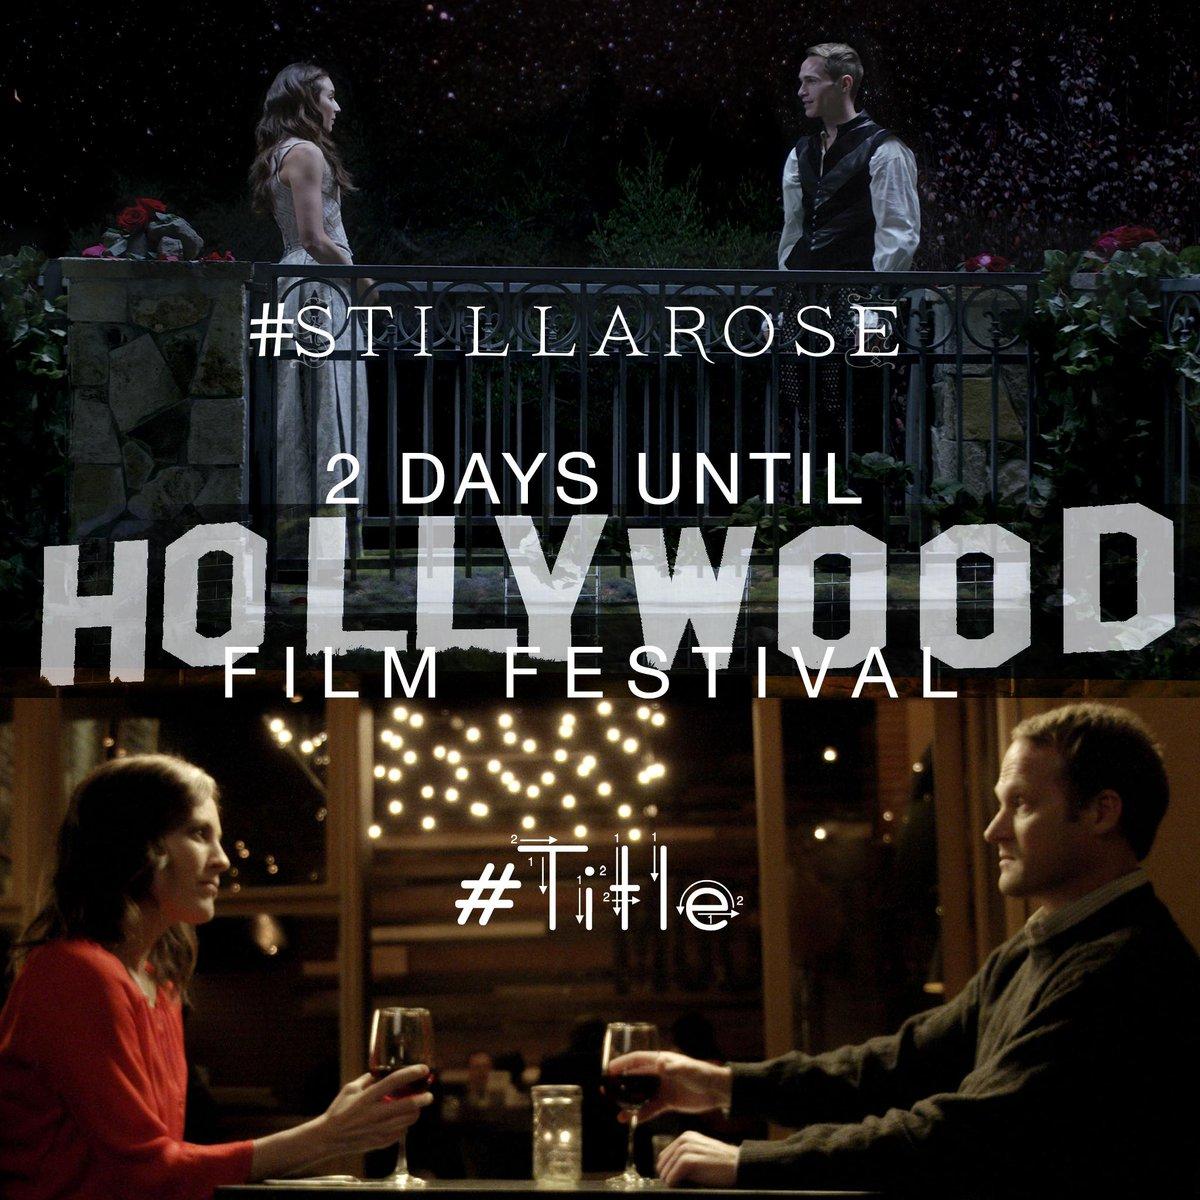 Still A Rose w/ @SleepintheGardn! Follow us on Instagram @HollywoodFilmFestival to join the movement! via ^HollywoodF http://t.co/lkFLoSQJkI